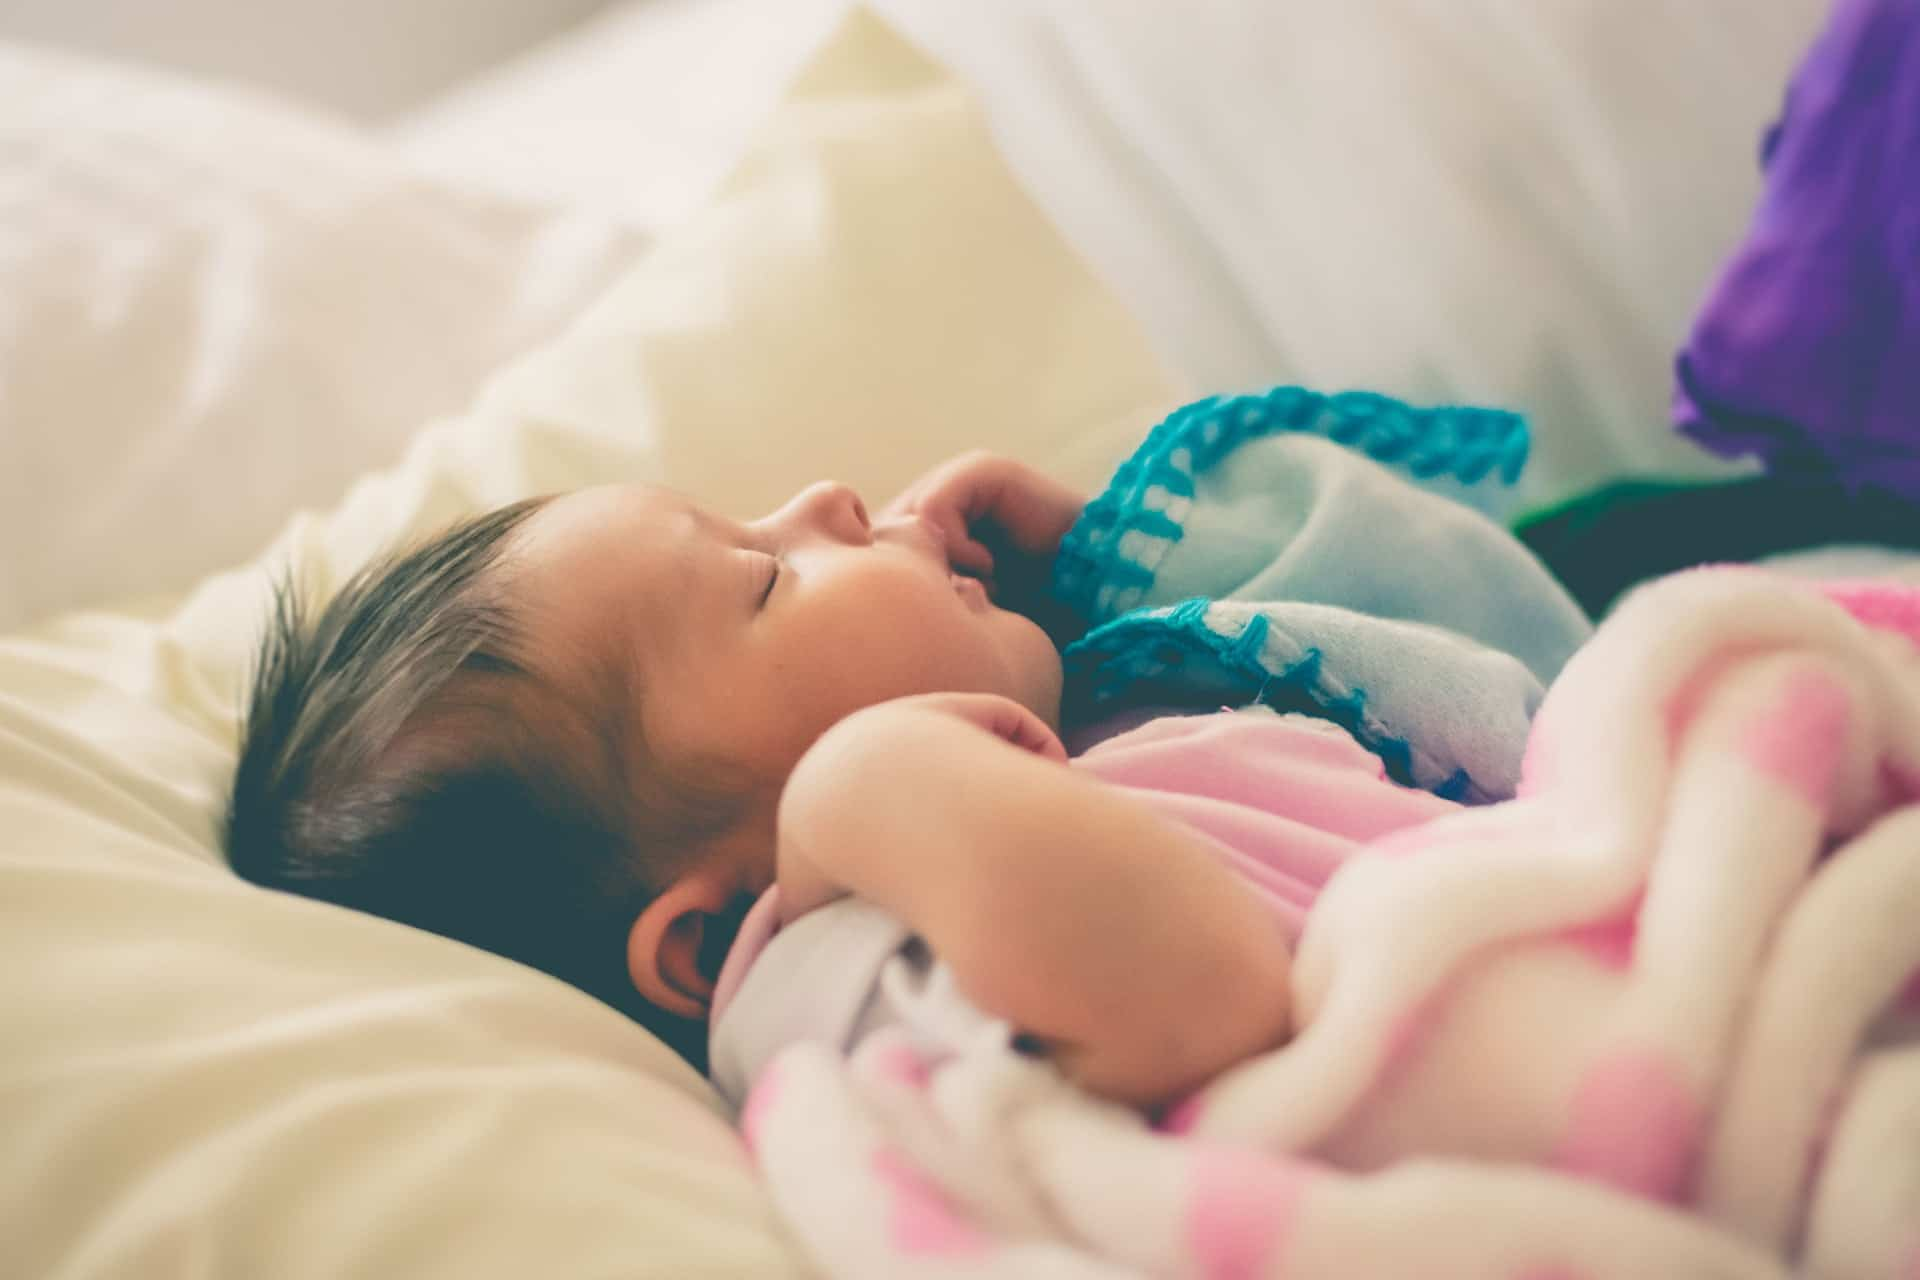 felipe salgado nVGT7ljsogk unsplash - When Can My Baby Sleep With a Blanket?